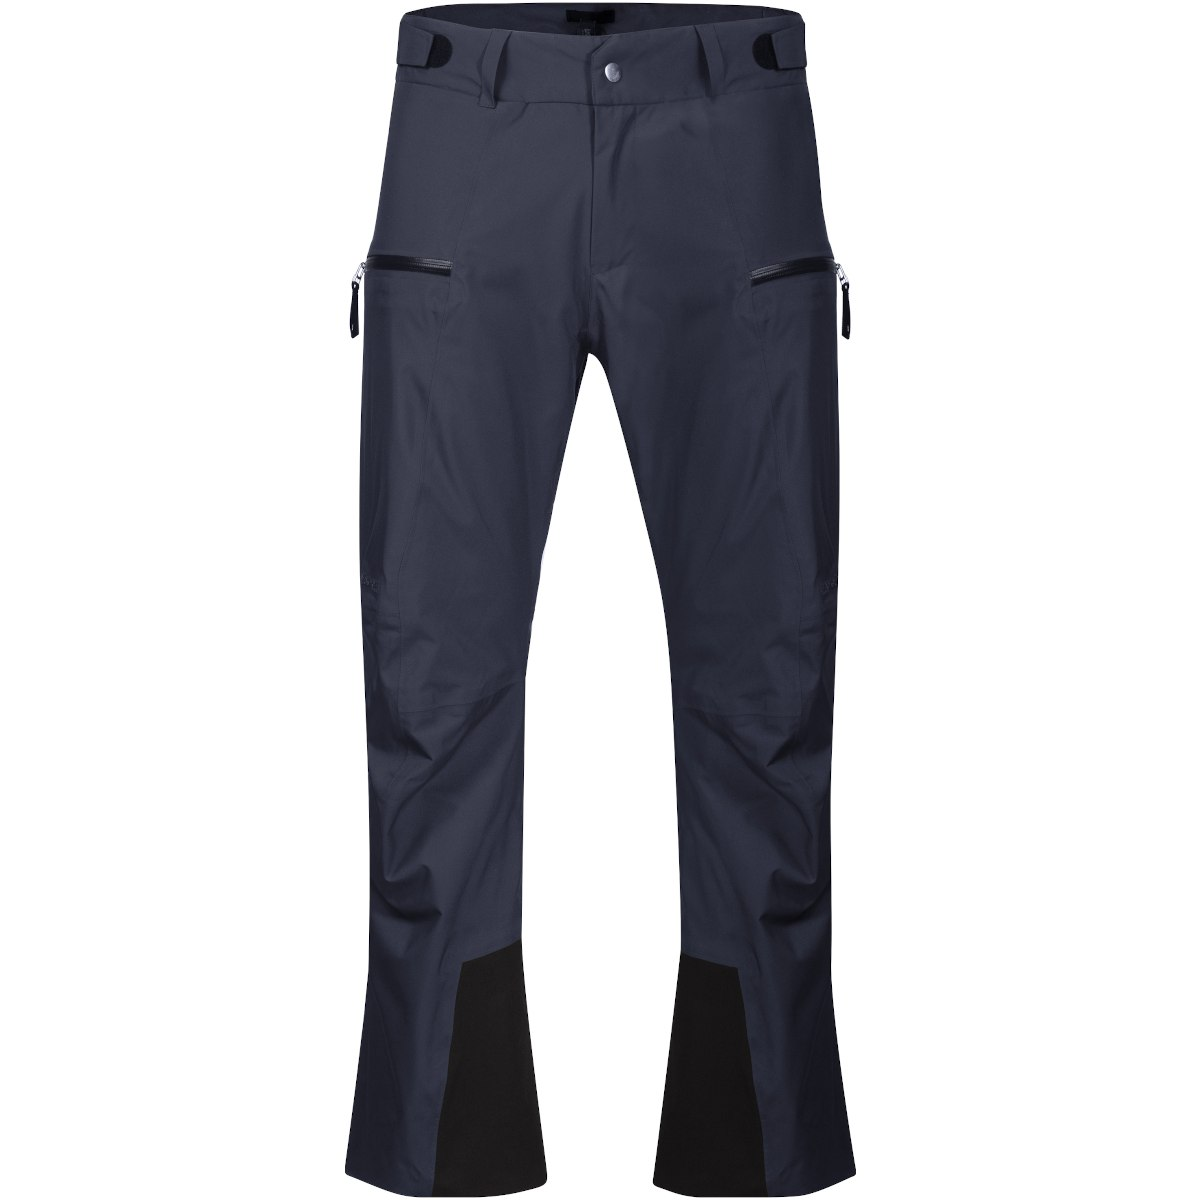 Bergans Stranda Insulated Pants - dark navy/fog blue